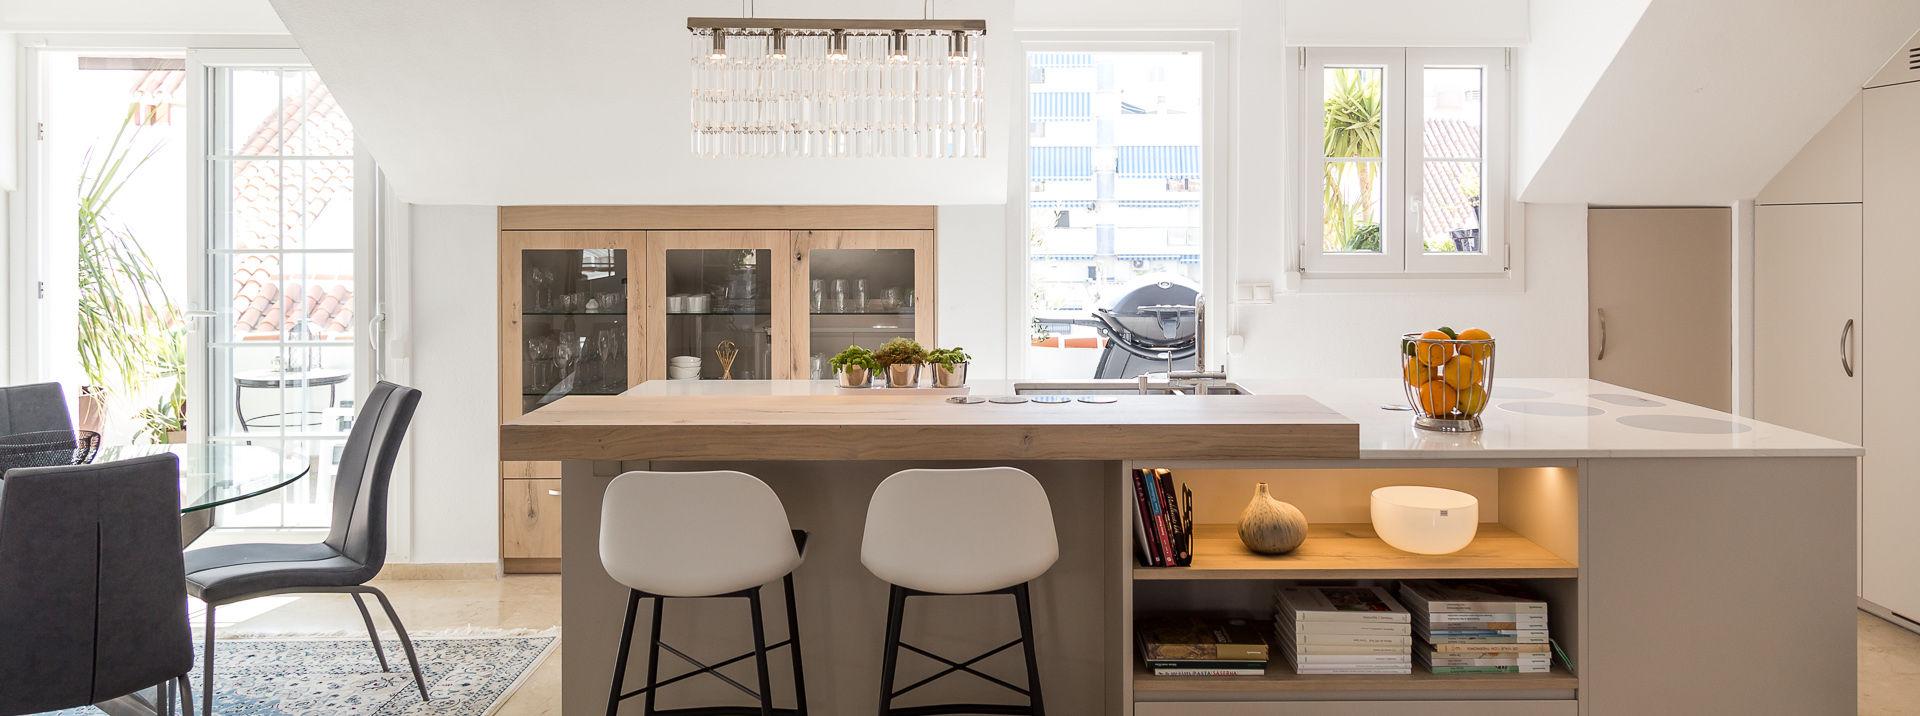 Nordic Muebles - Kitchens - Modern - Nube